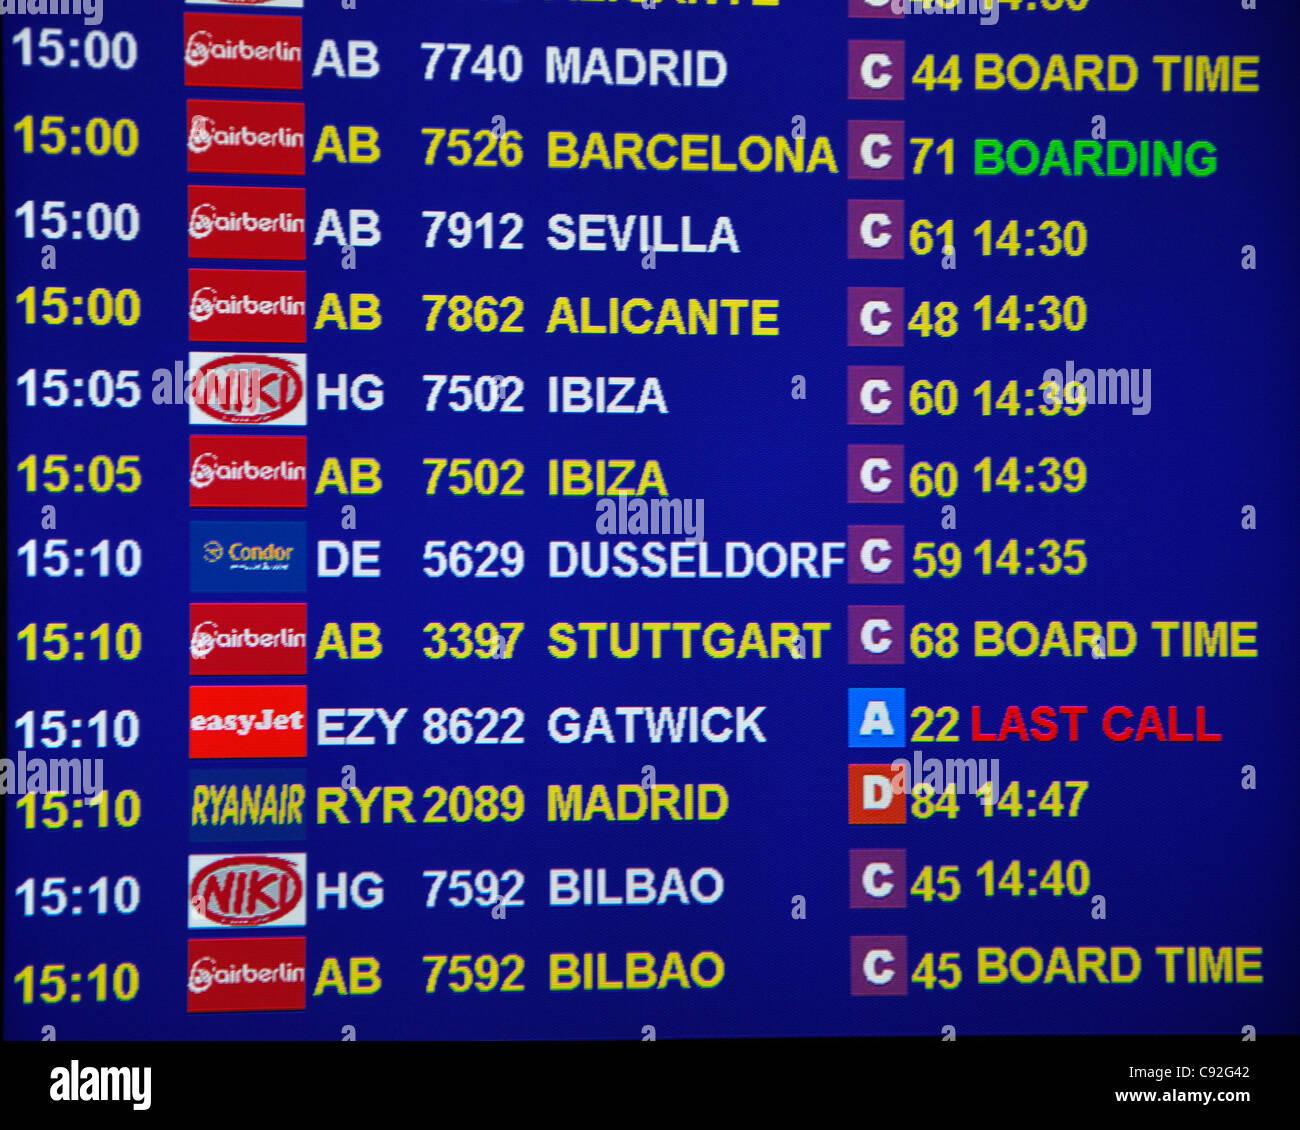 Airport palma de mallorca ankunft